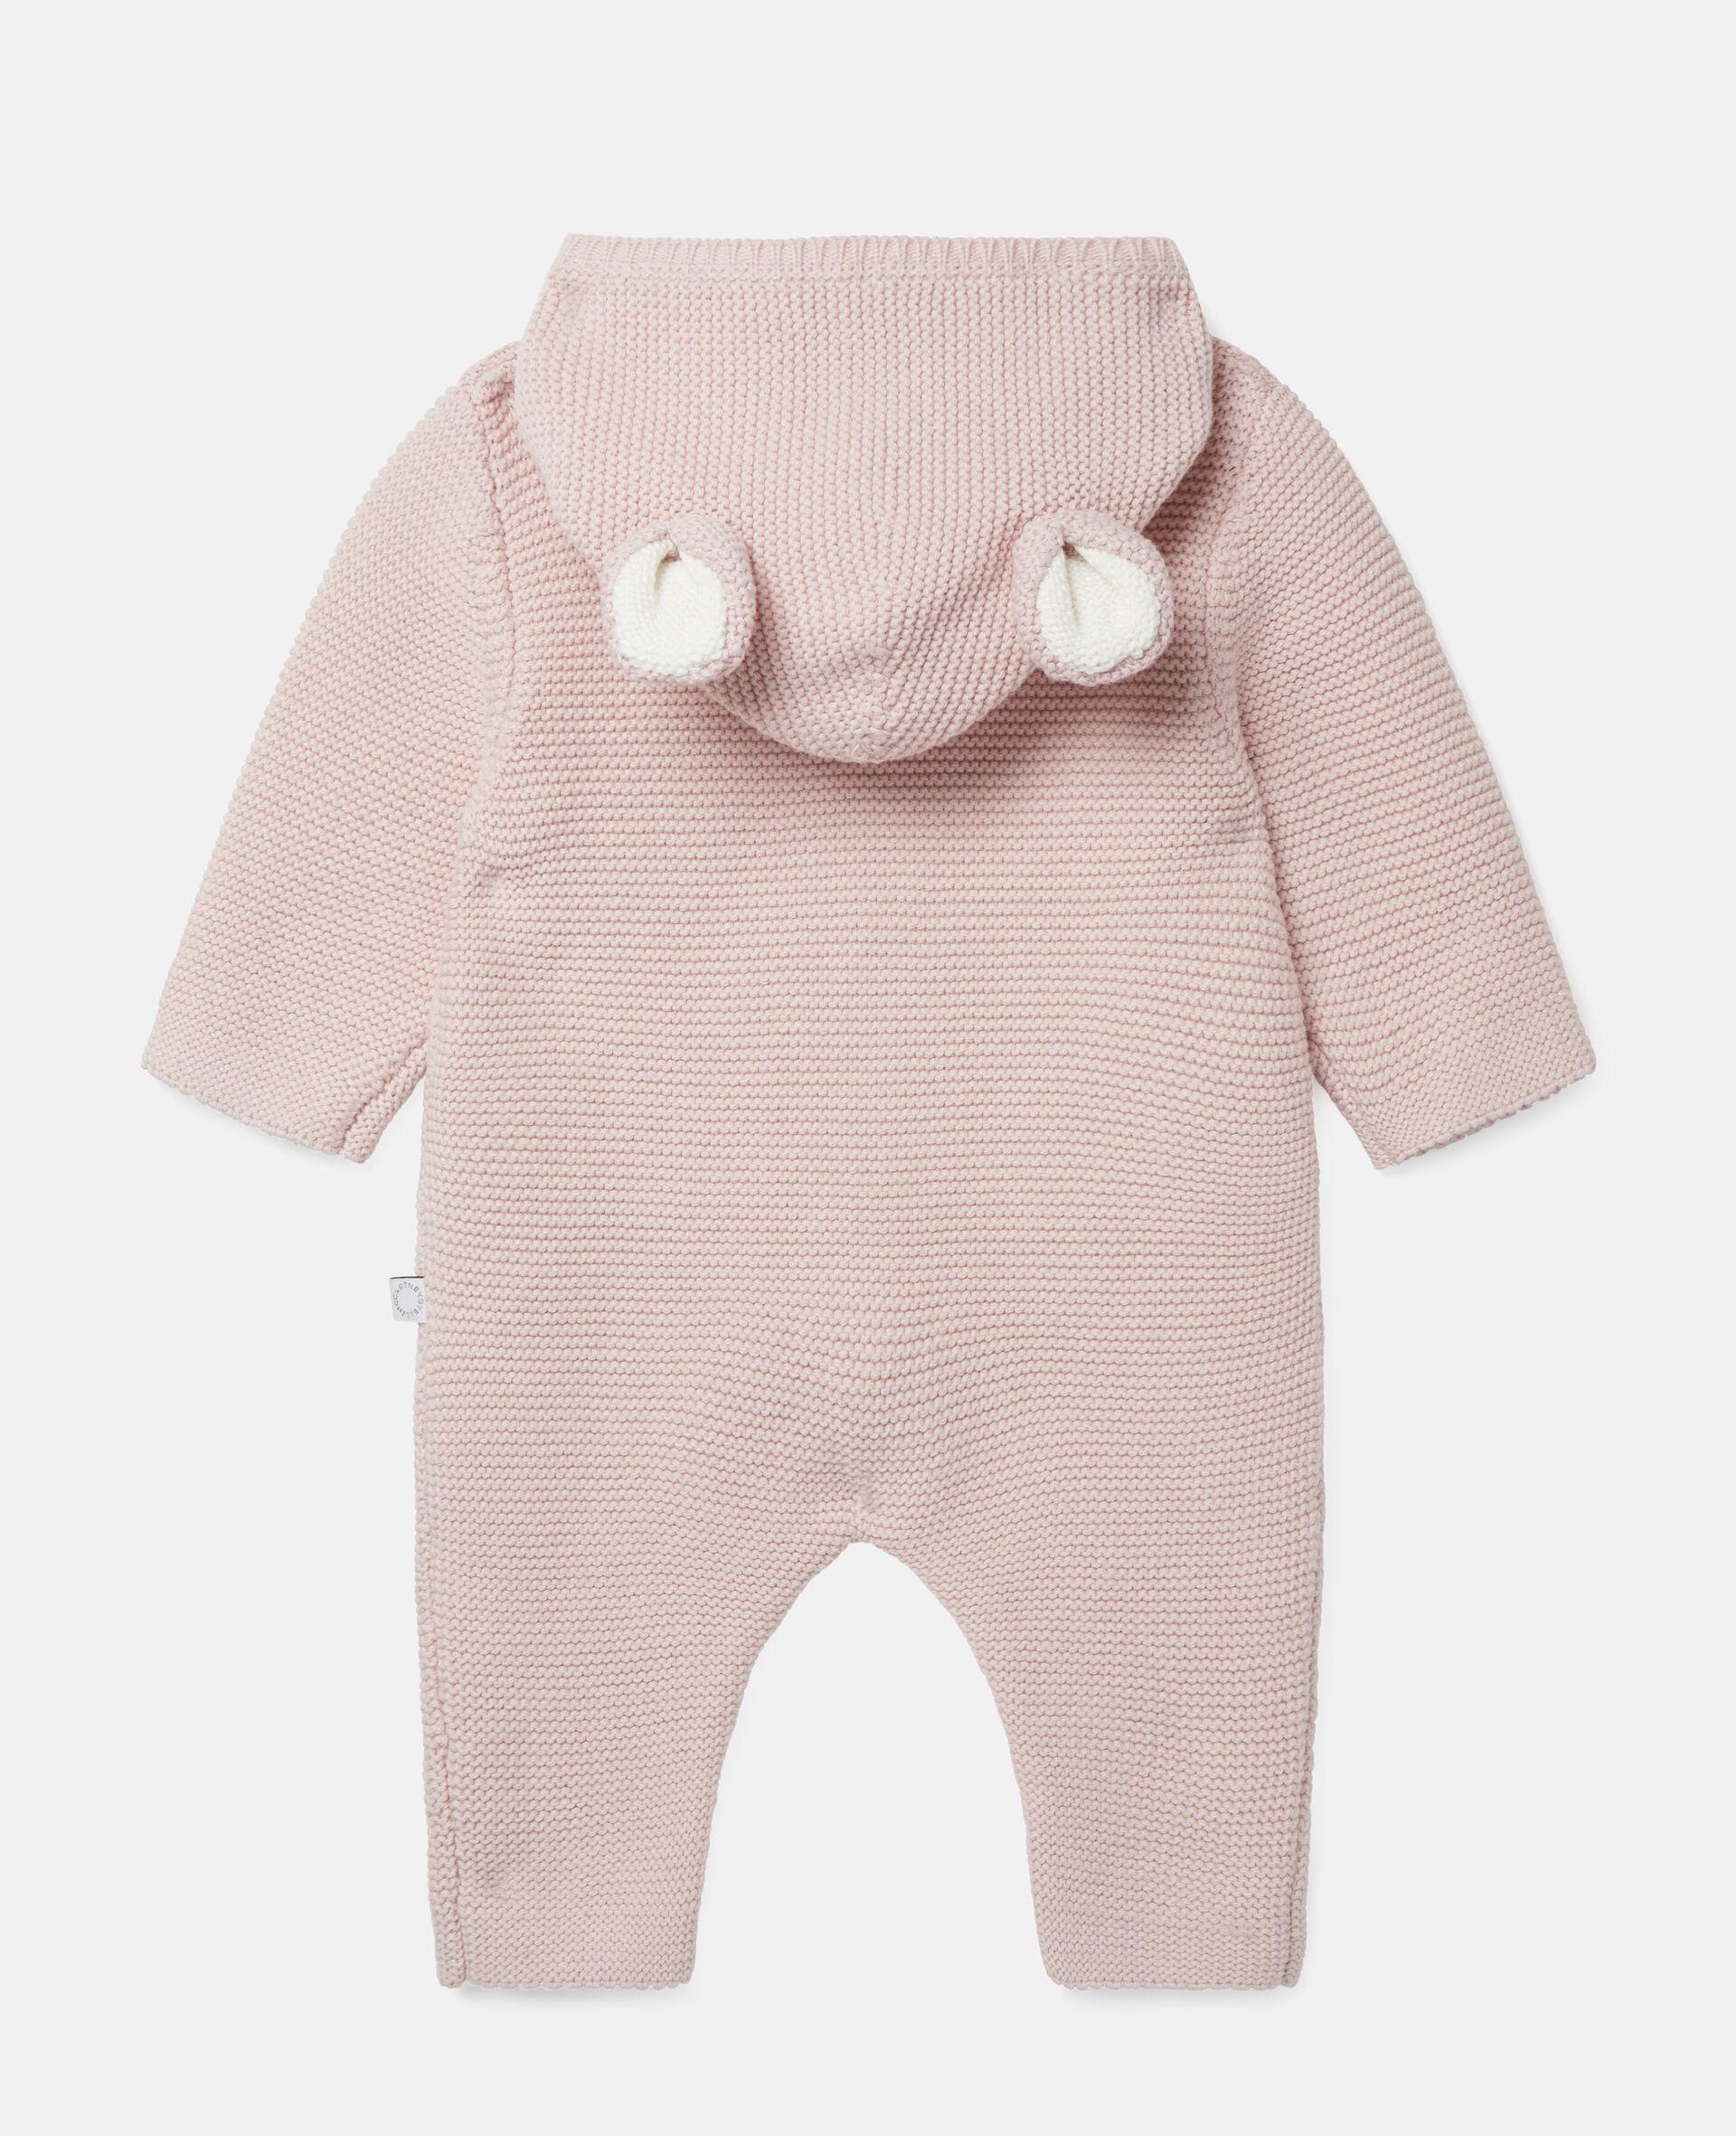 Doggie Knit Jumpsuit-Pink-large image number 3